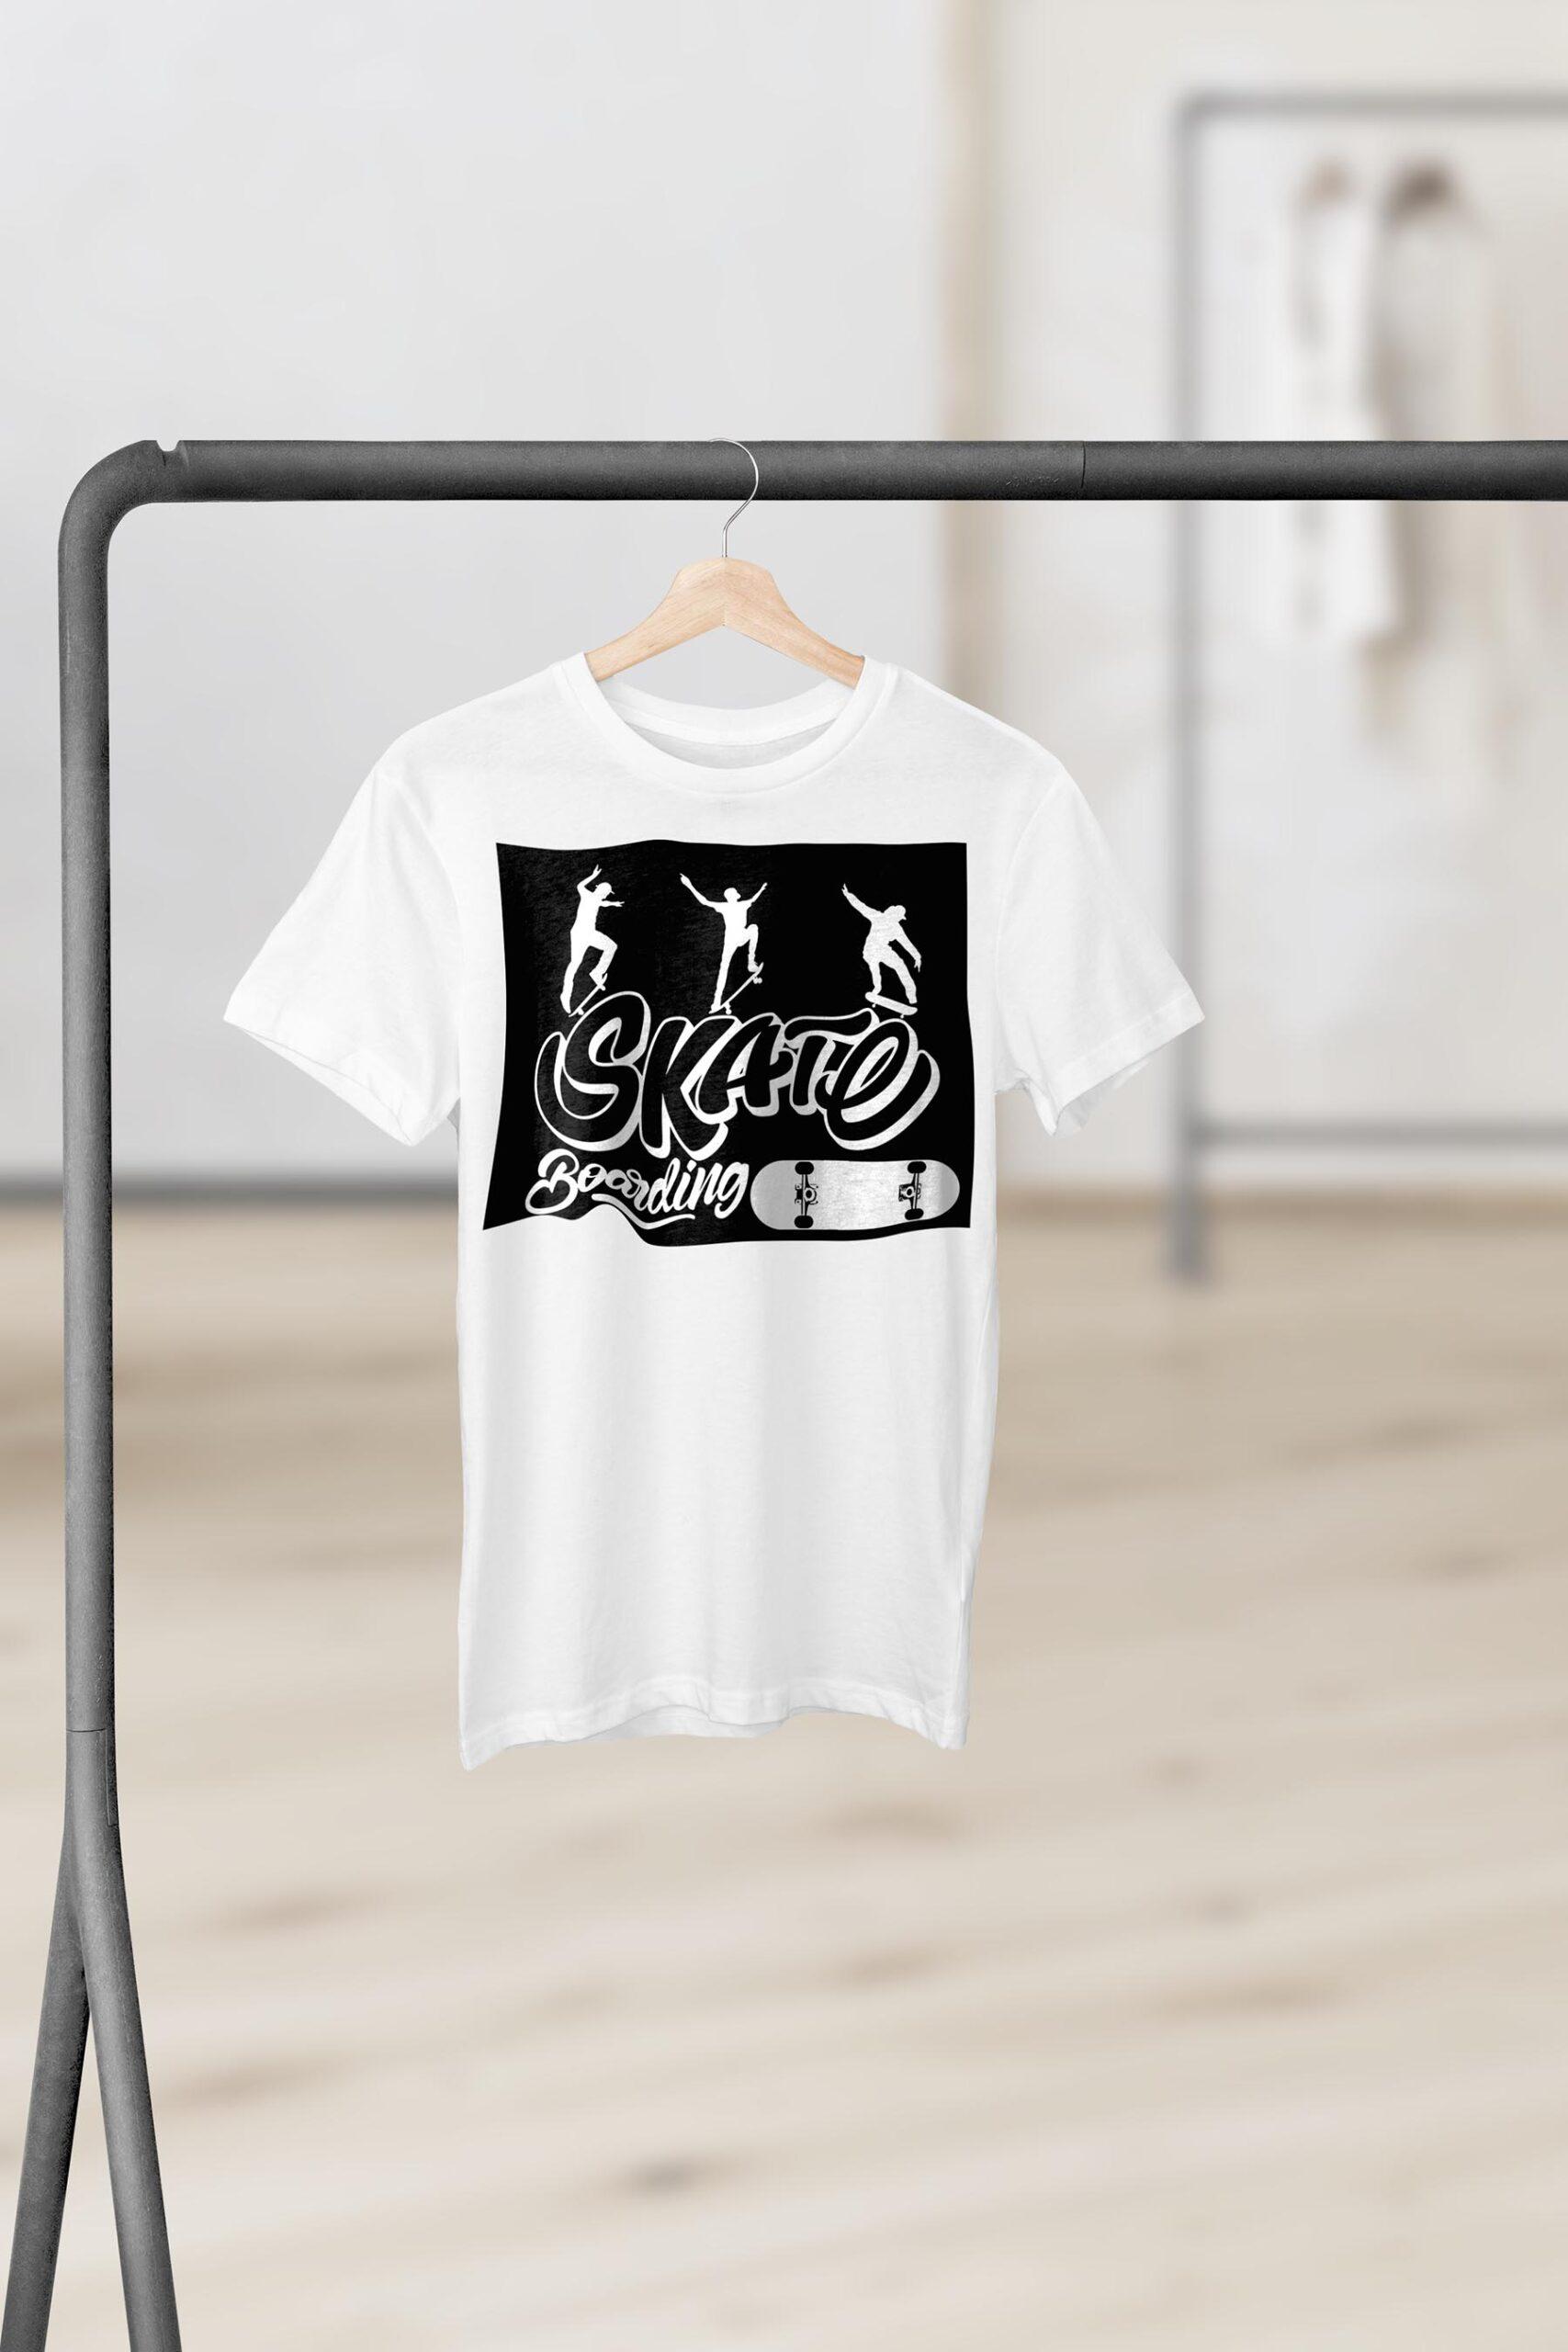 Free Skateboarding File